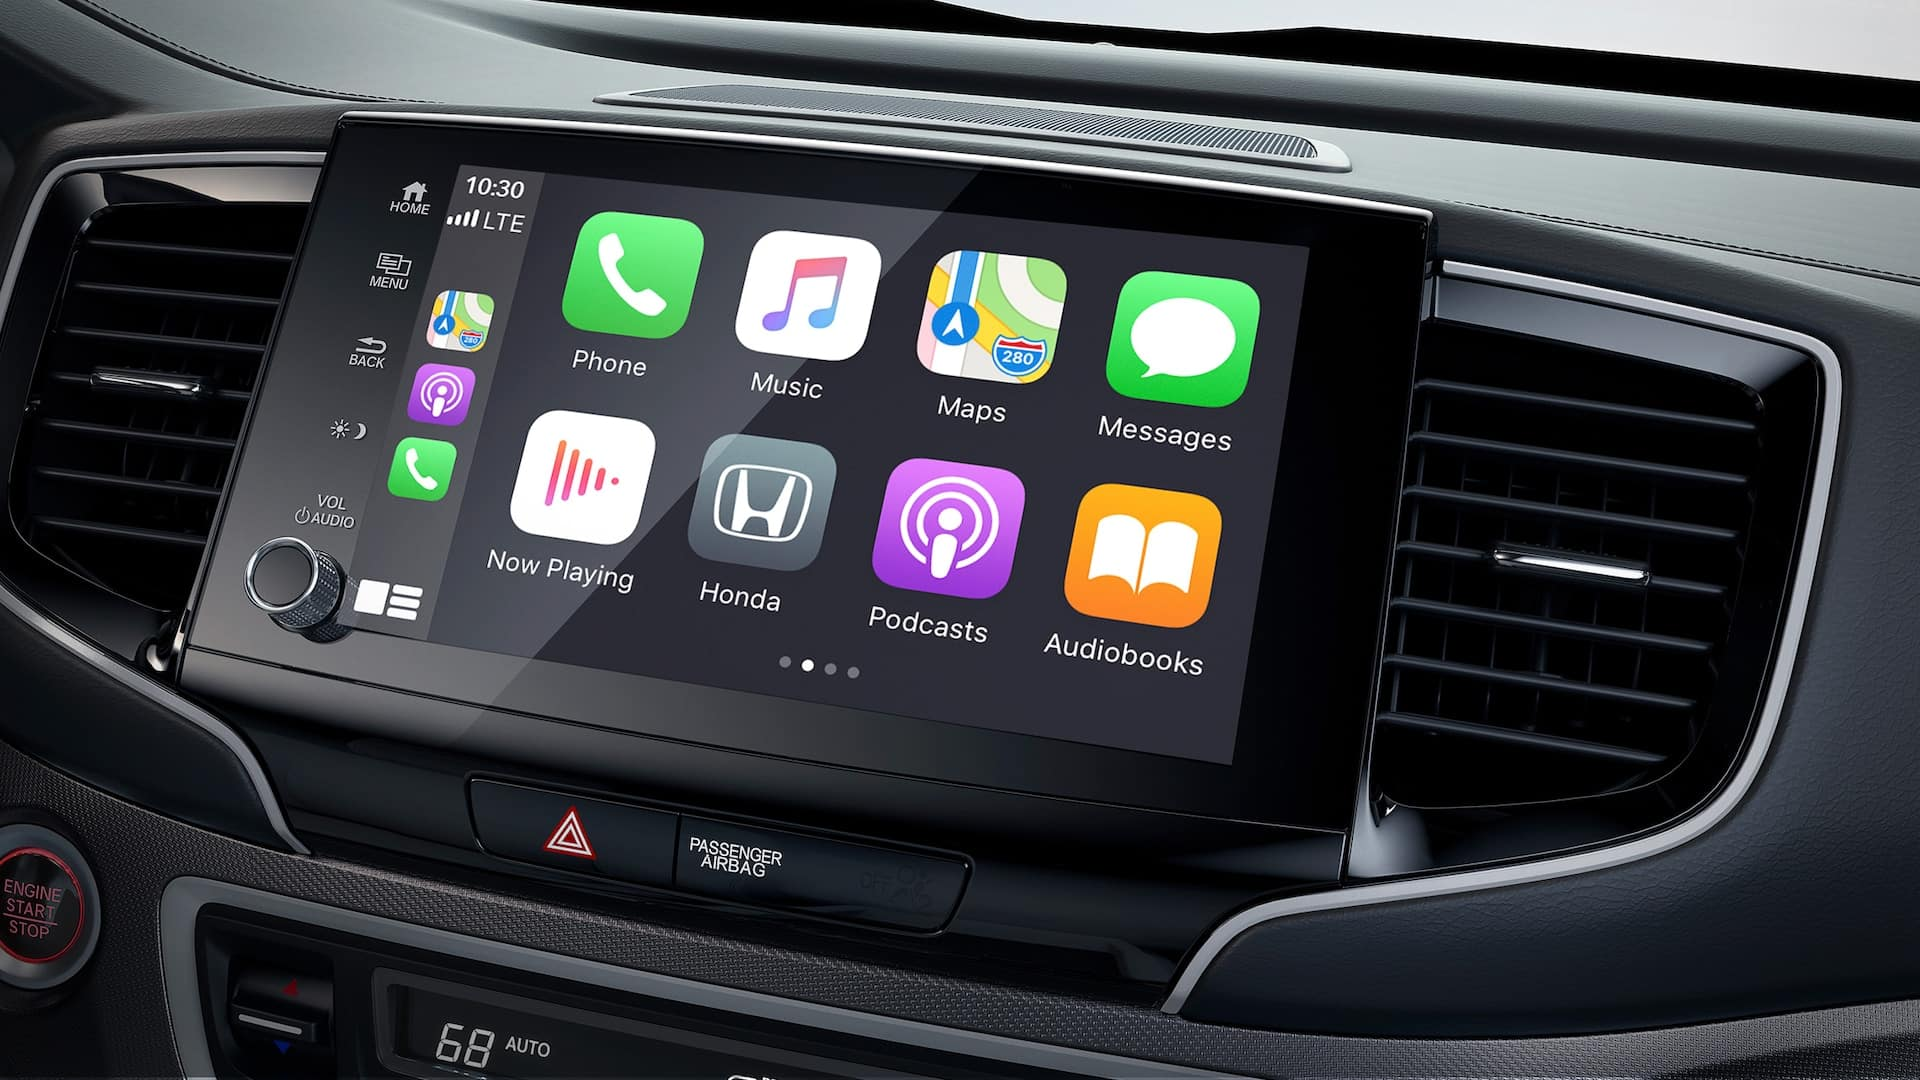 2021 Honda Ridgeline with Apple CarPlay and Android Auto Integration